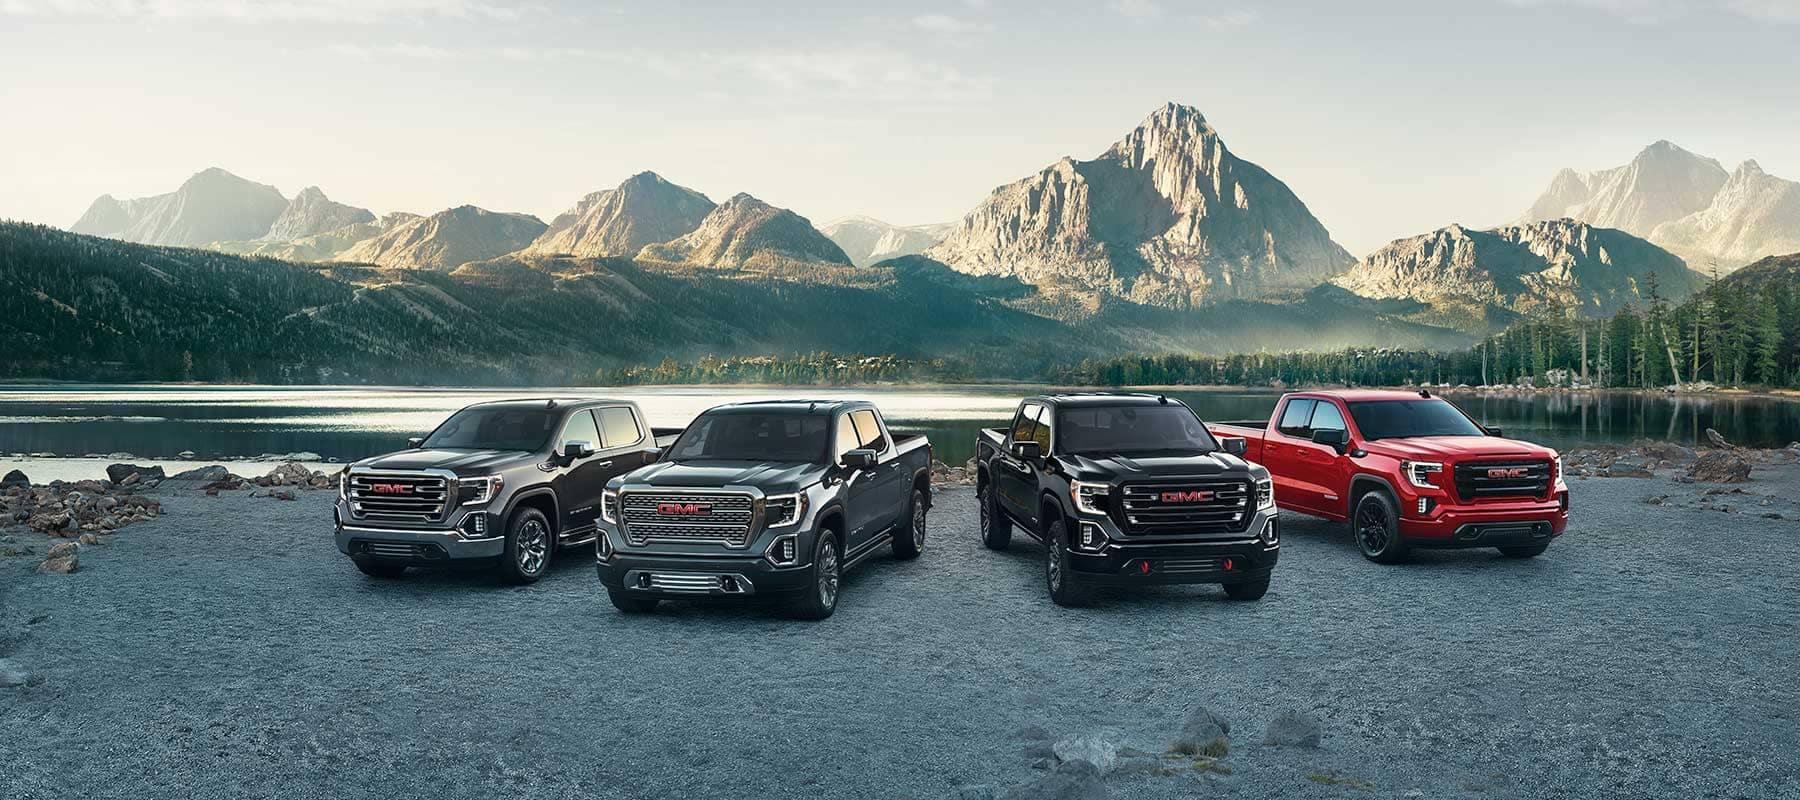 2019-GMC-trucks